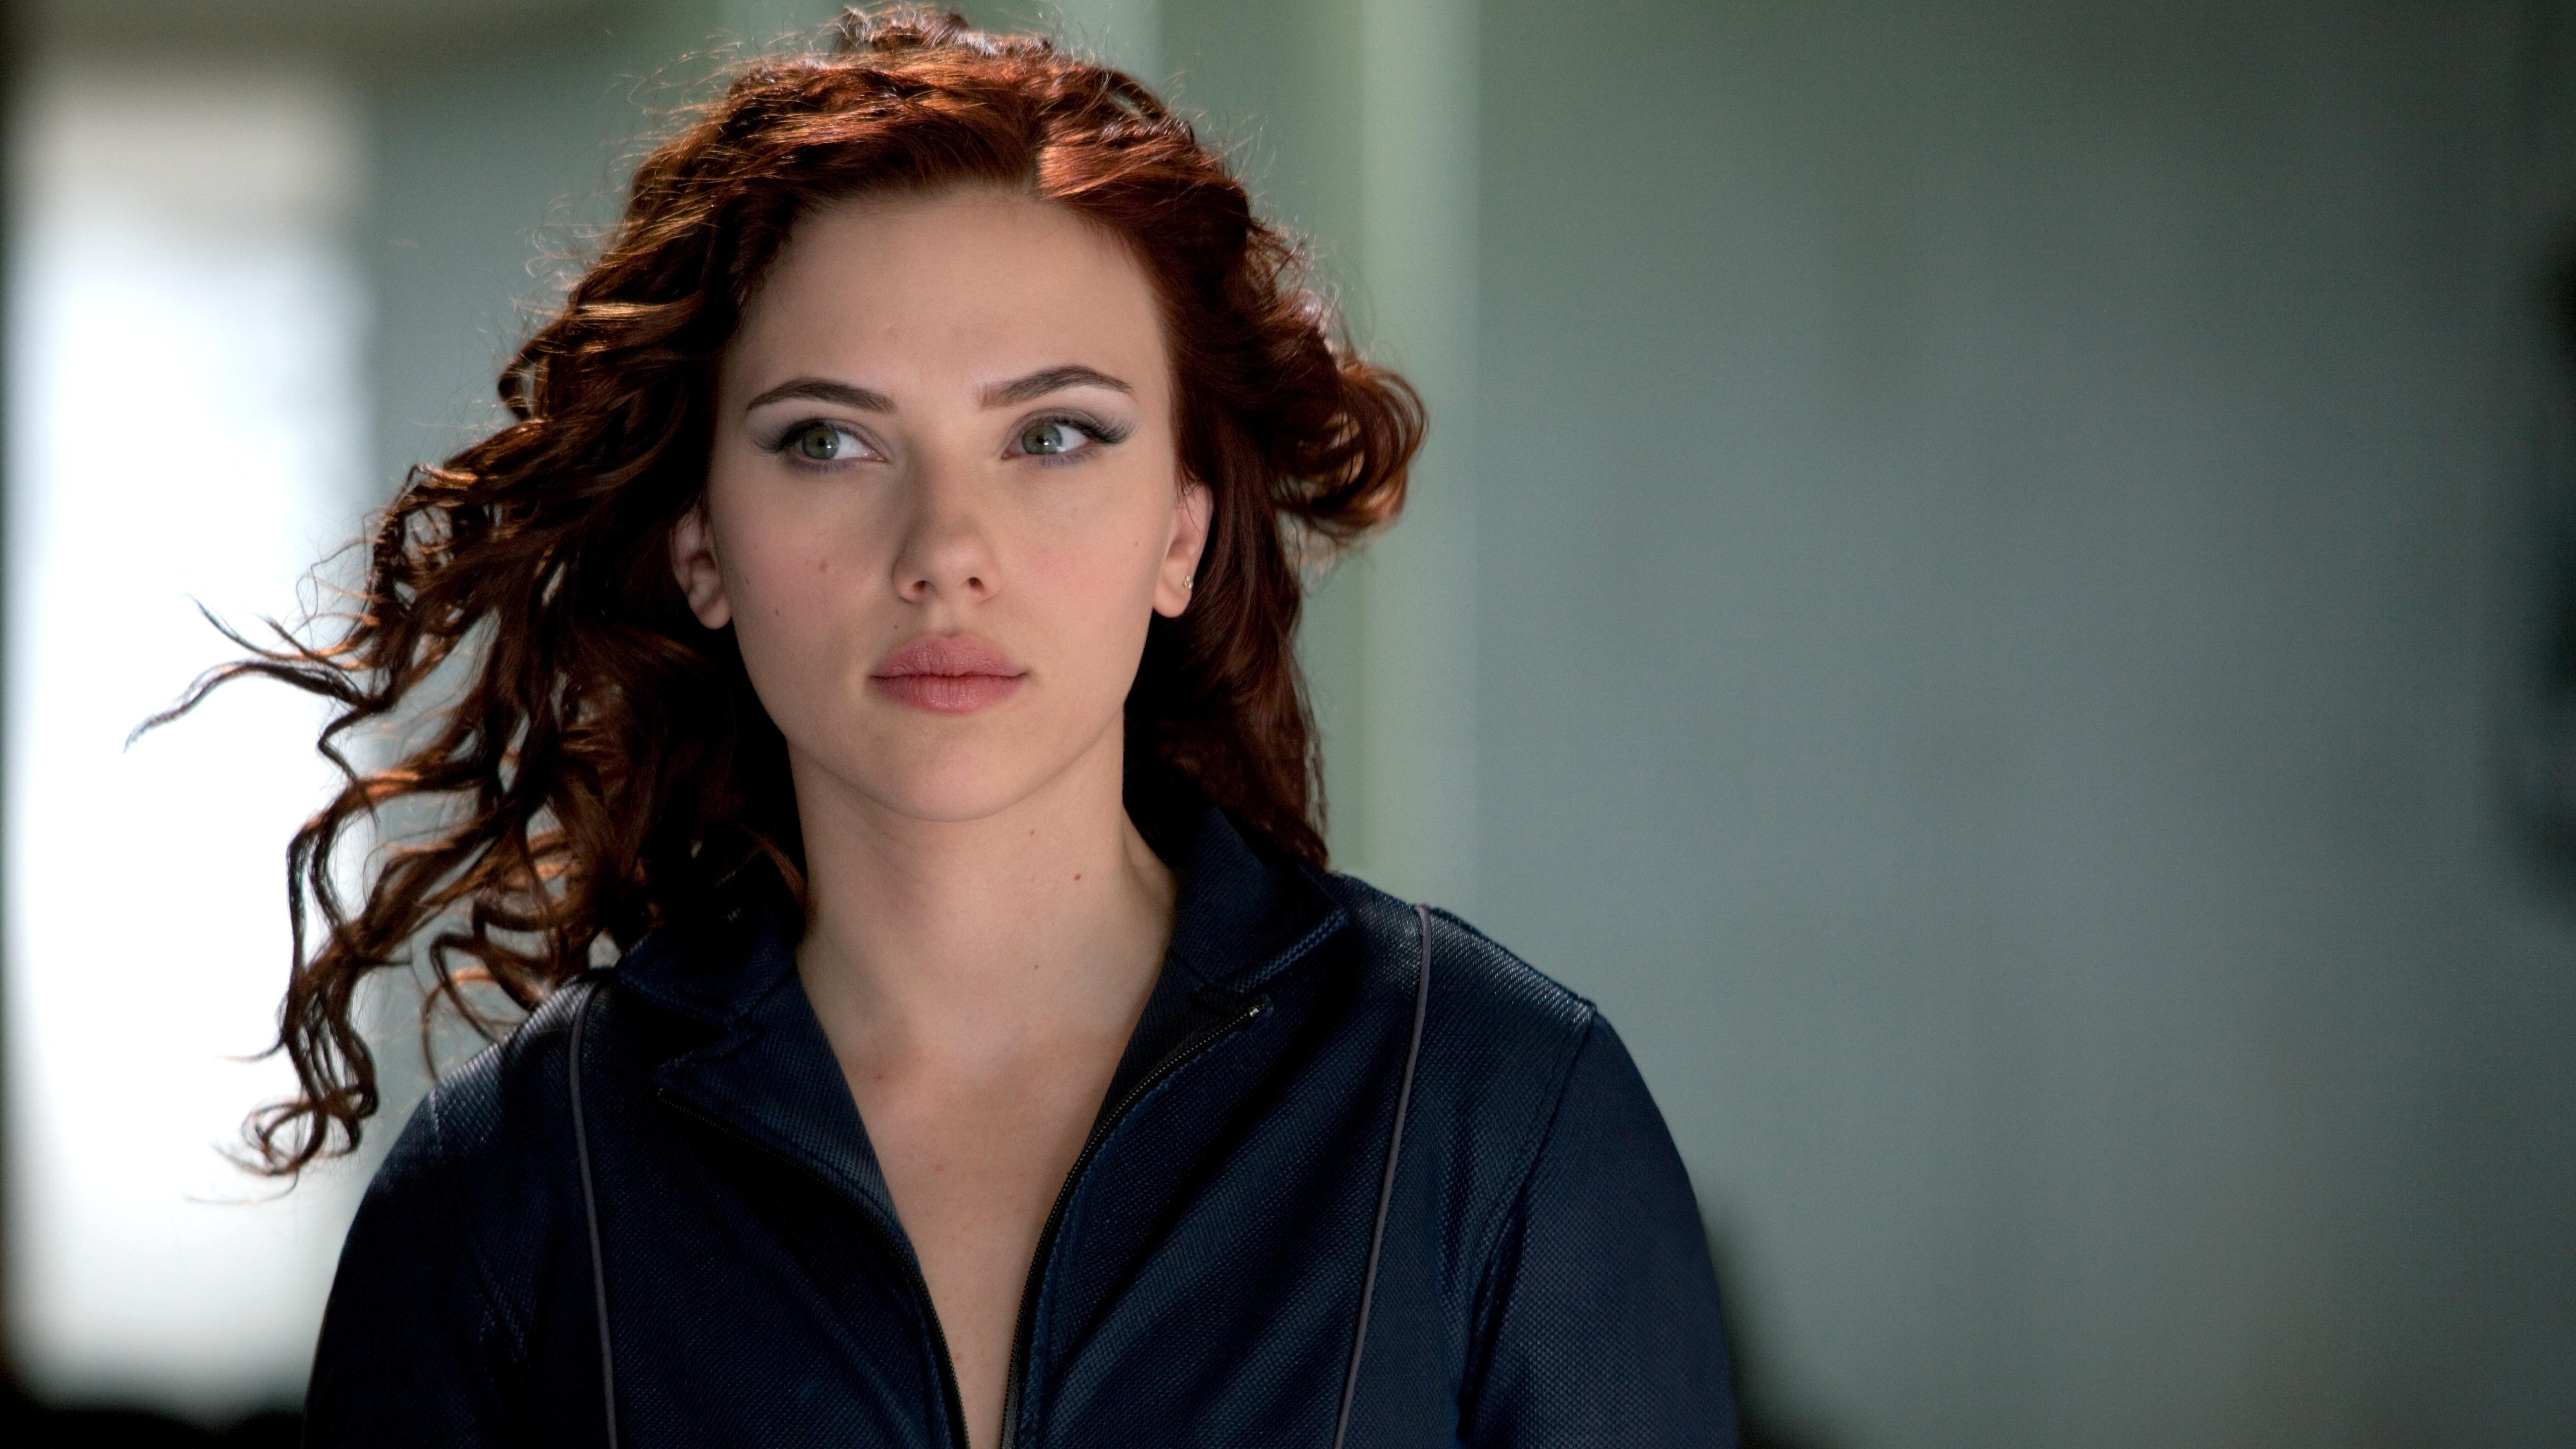 Scarlett Johansson 4k Wallpapers Wallpaper Cave